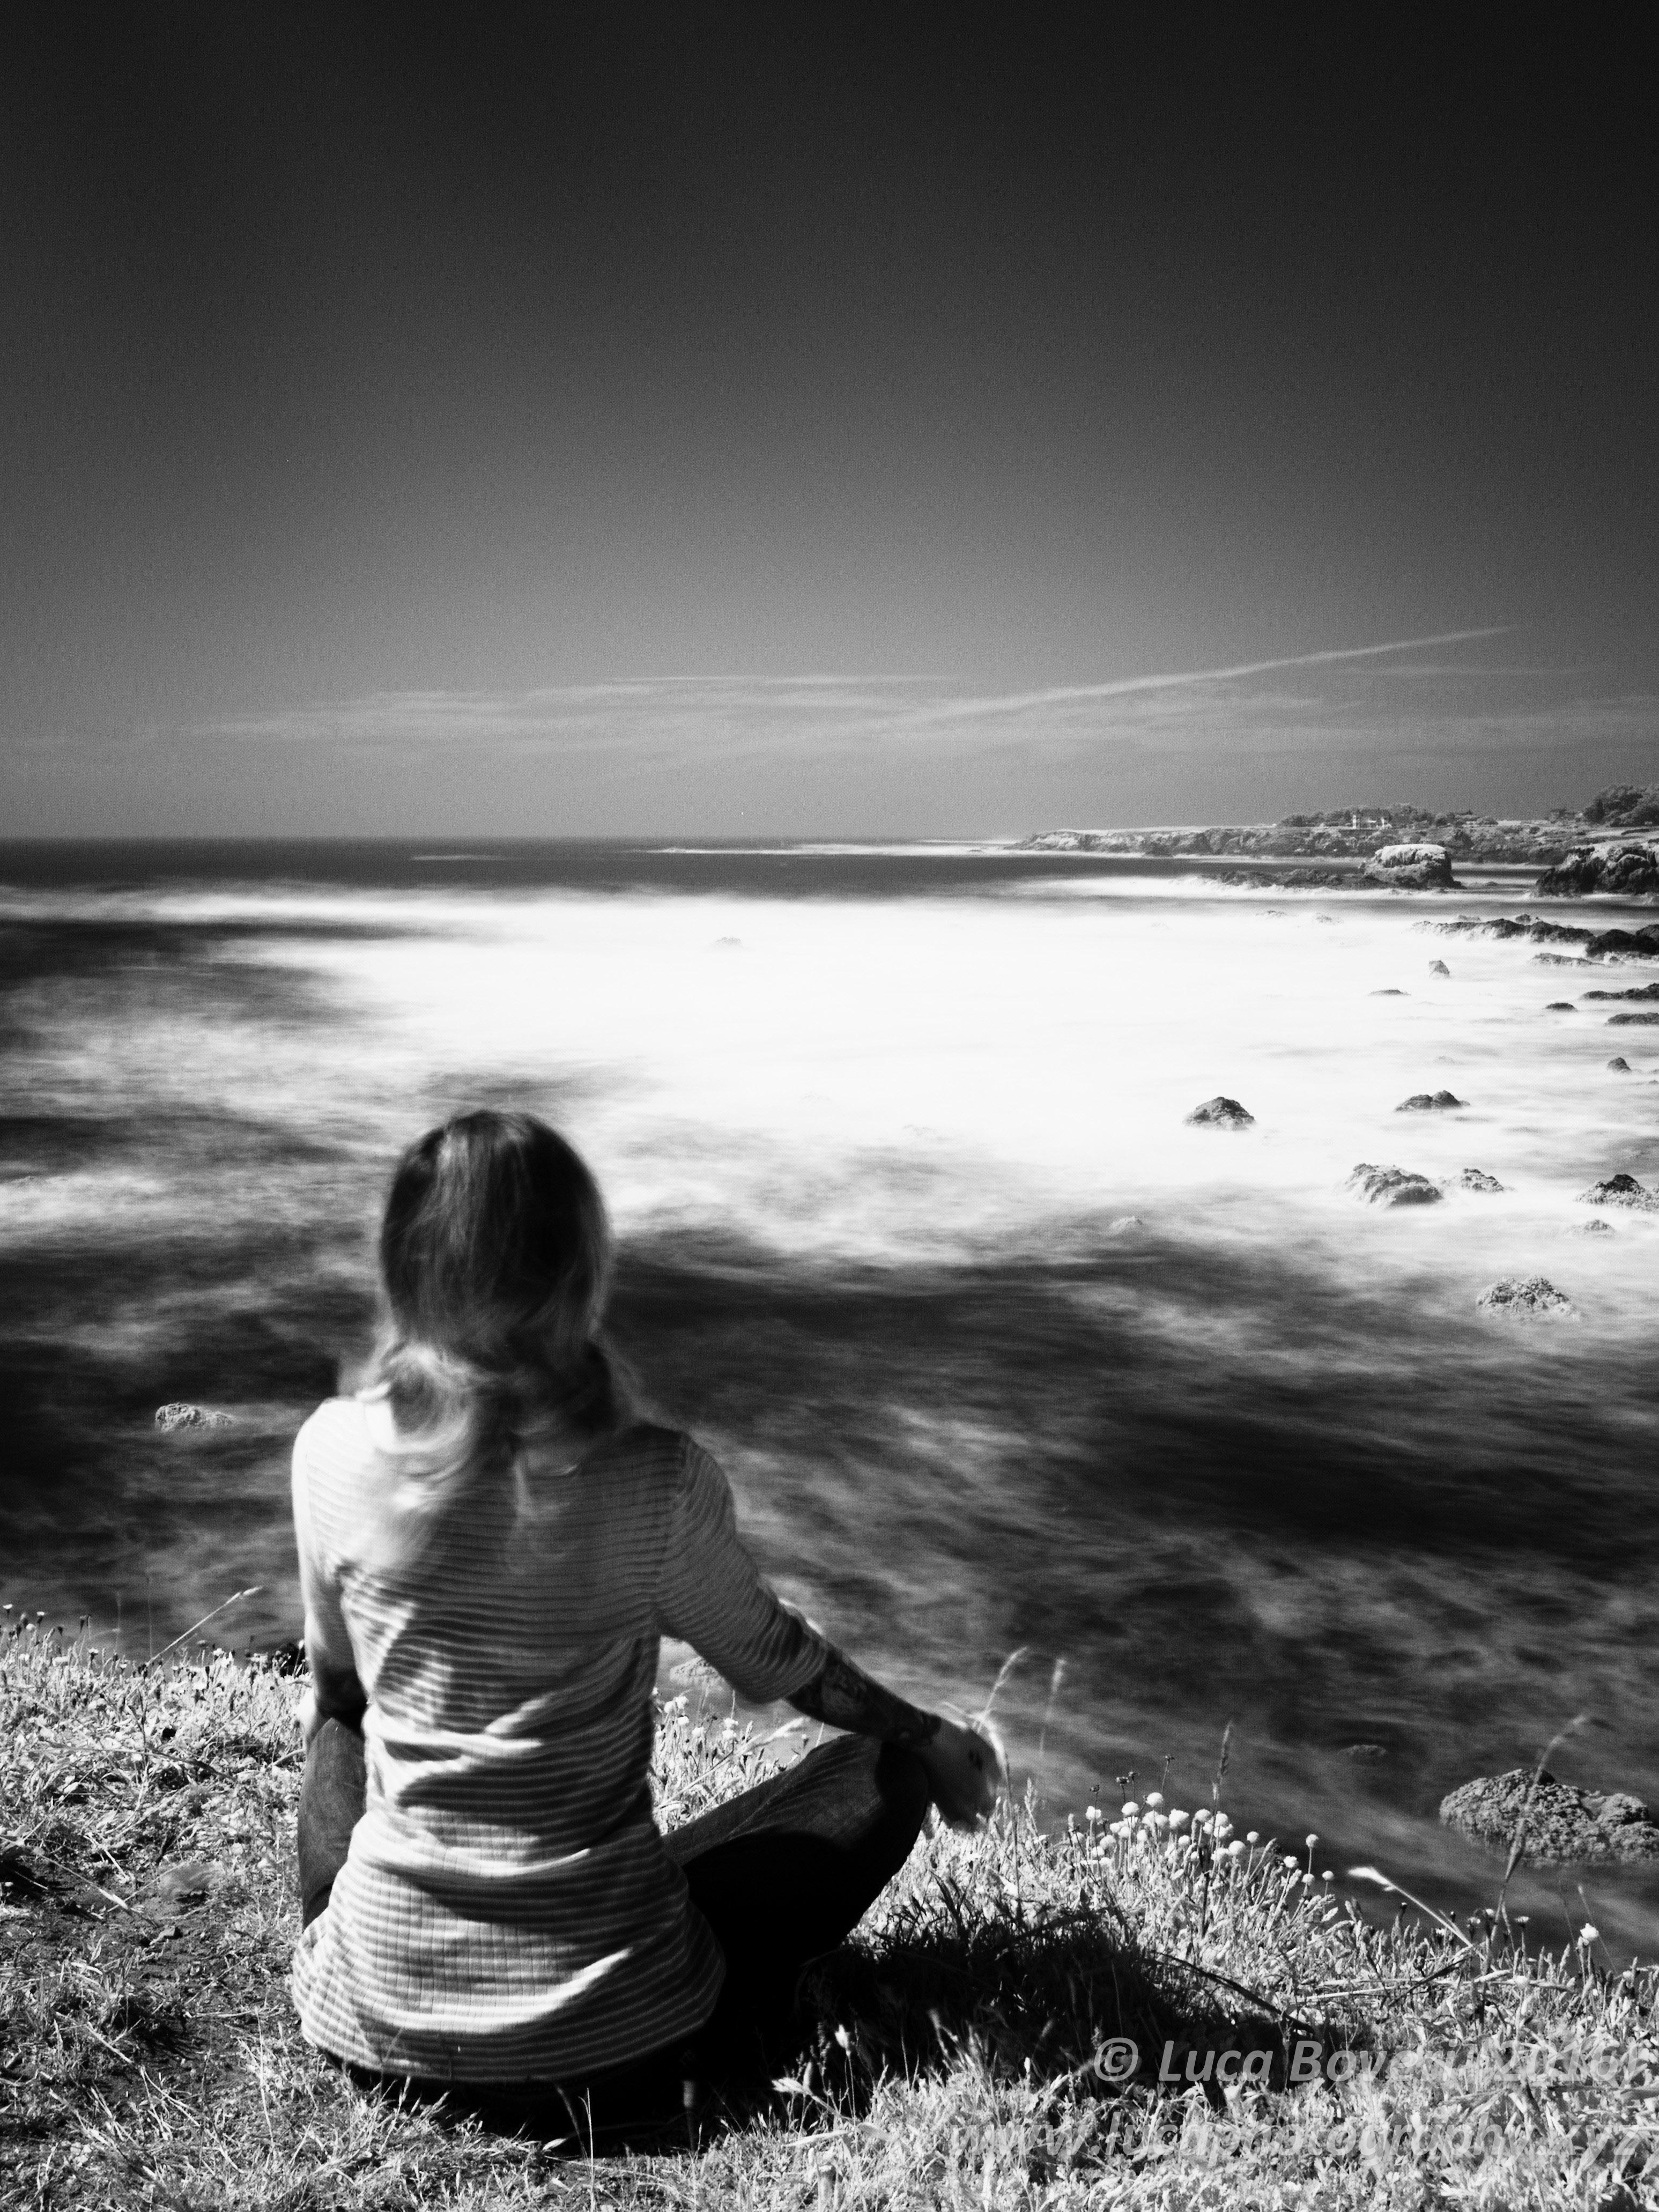 Meditating woman. @lucaboveri